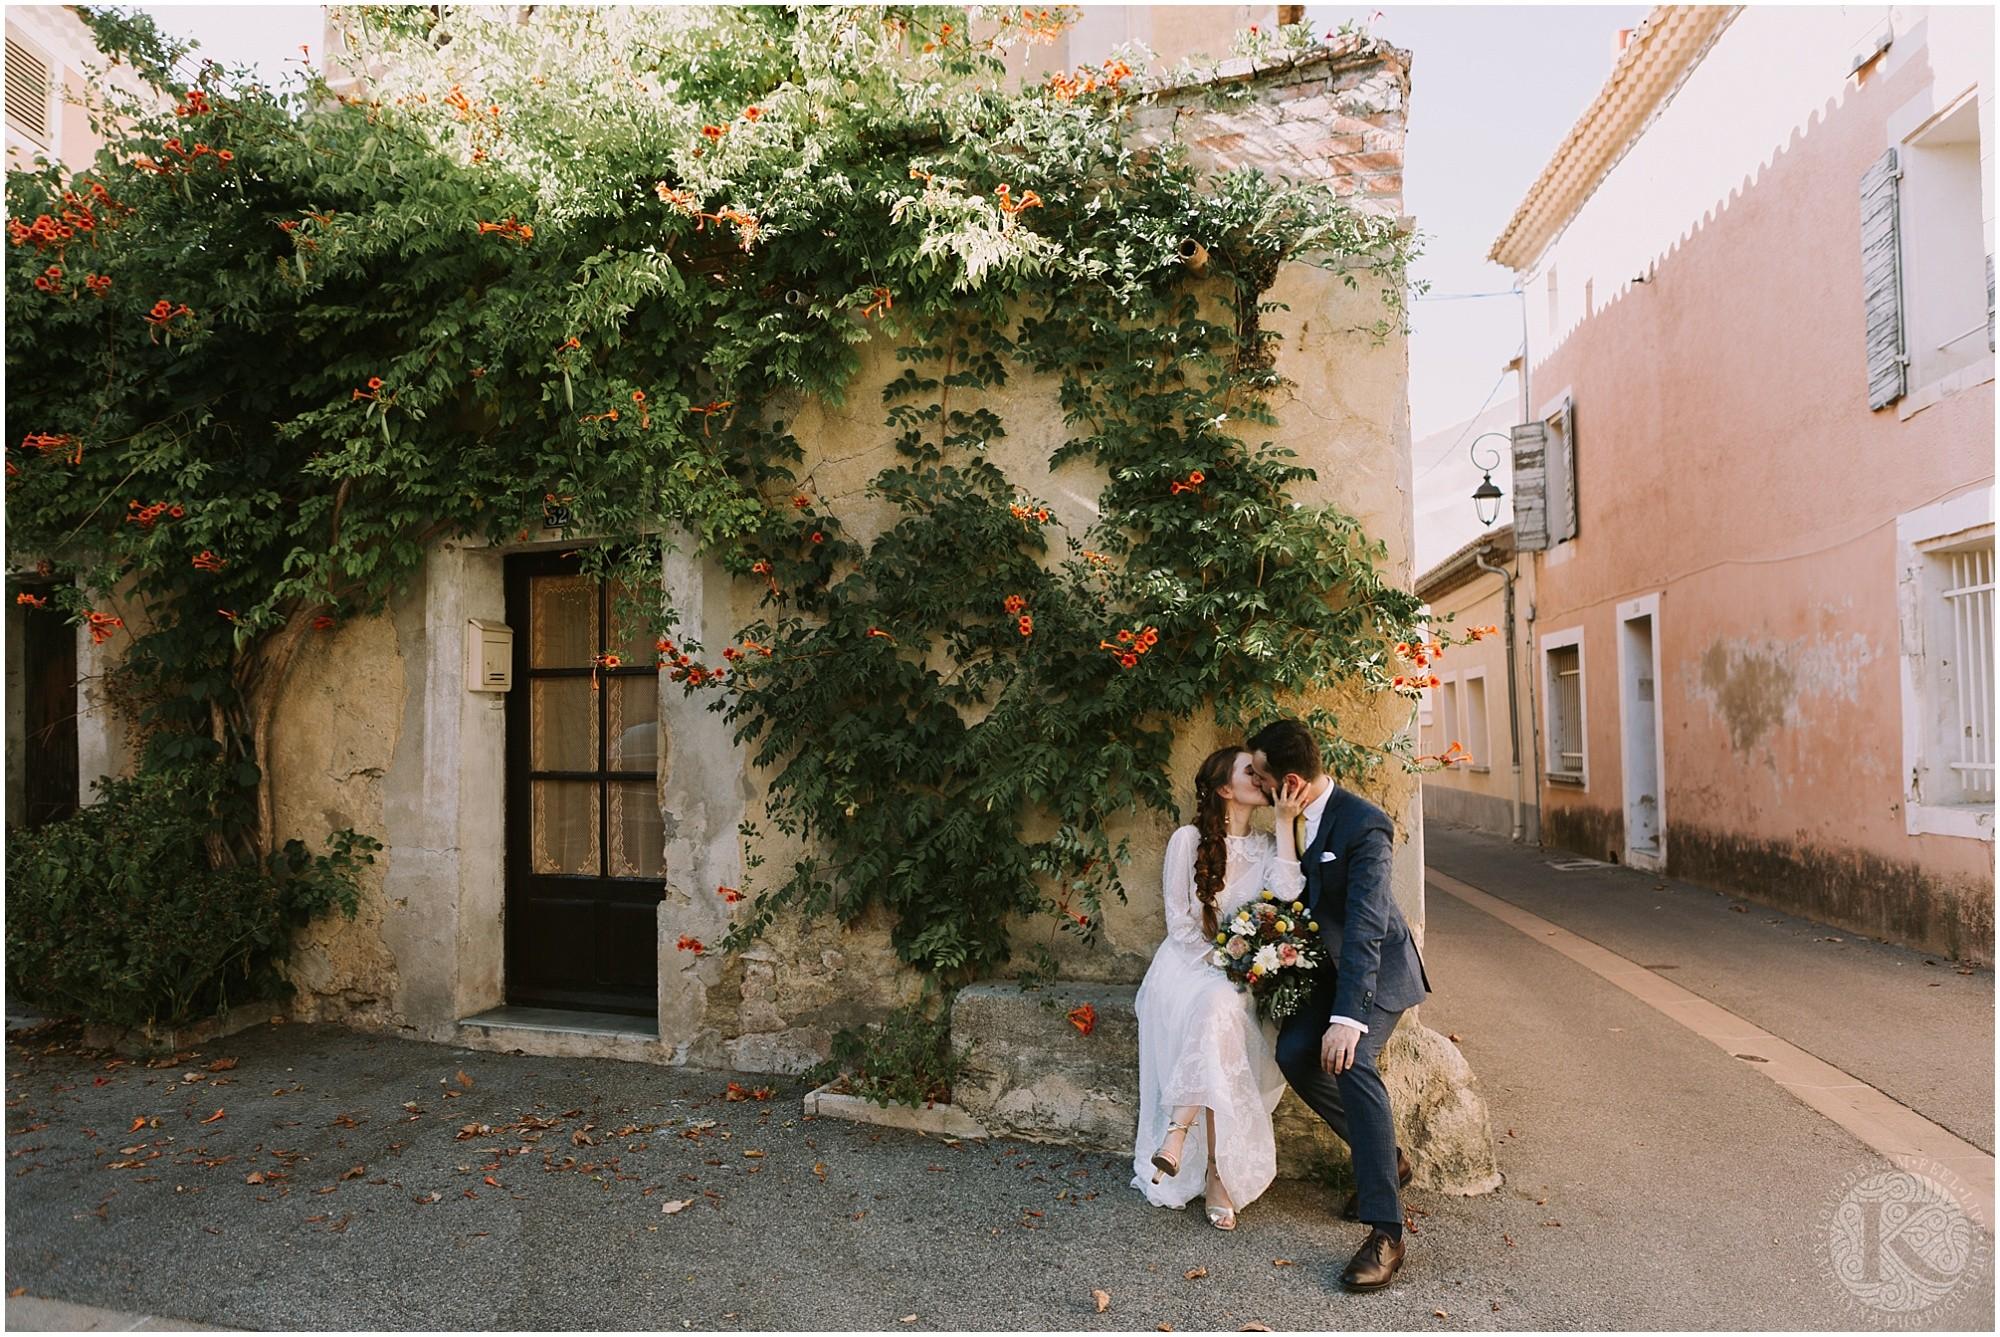 Kateryna-photos-photographe-mariage-vaucluse-provence-avignon-ferme-st-hugues_0045.jpg